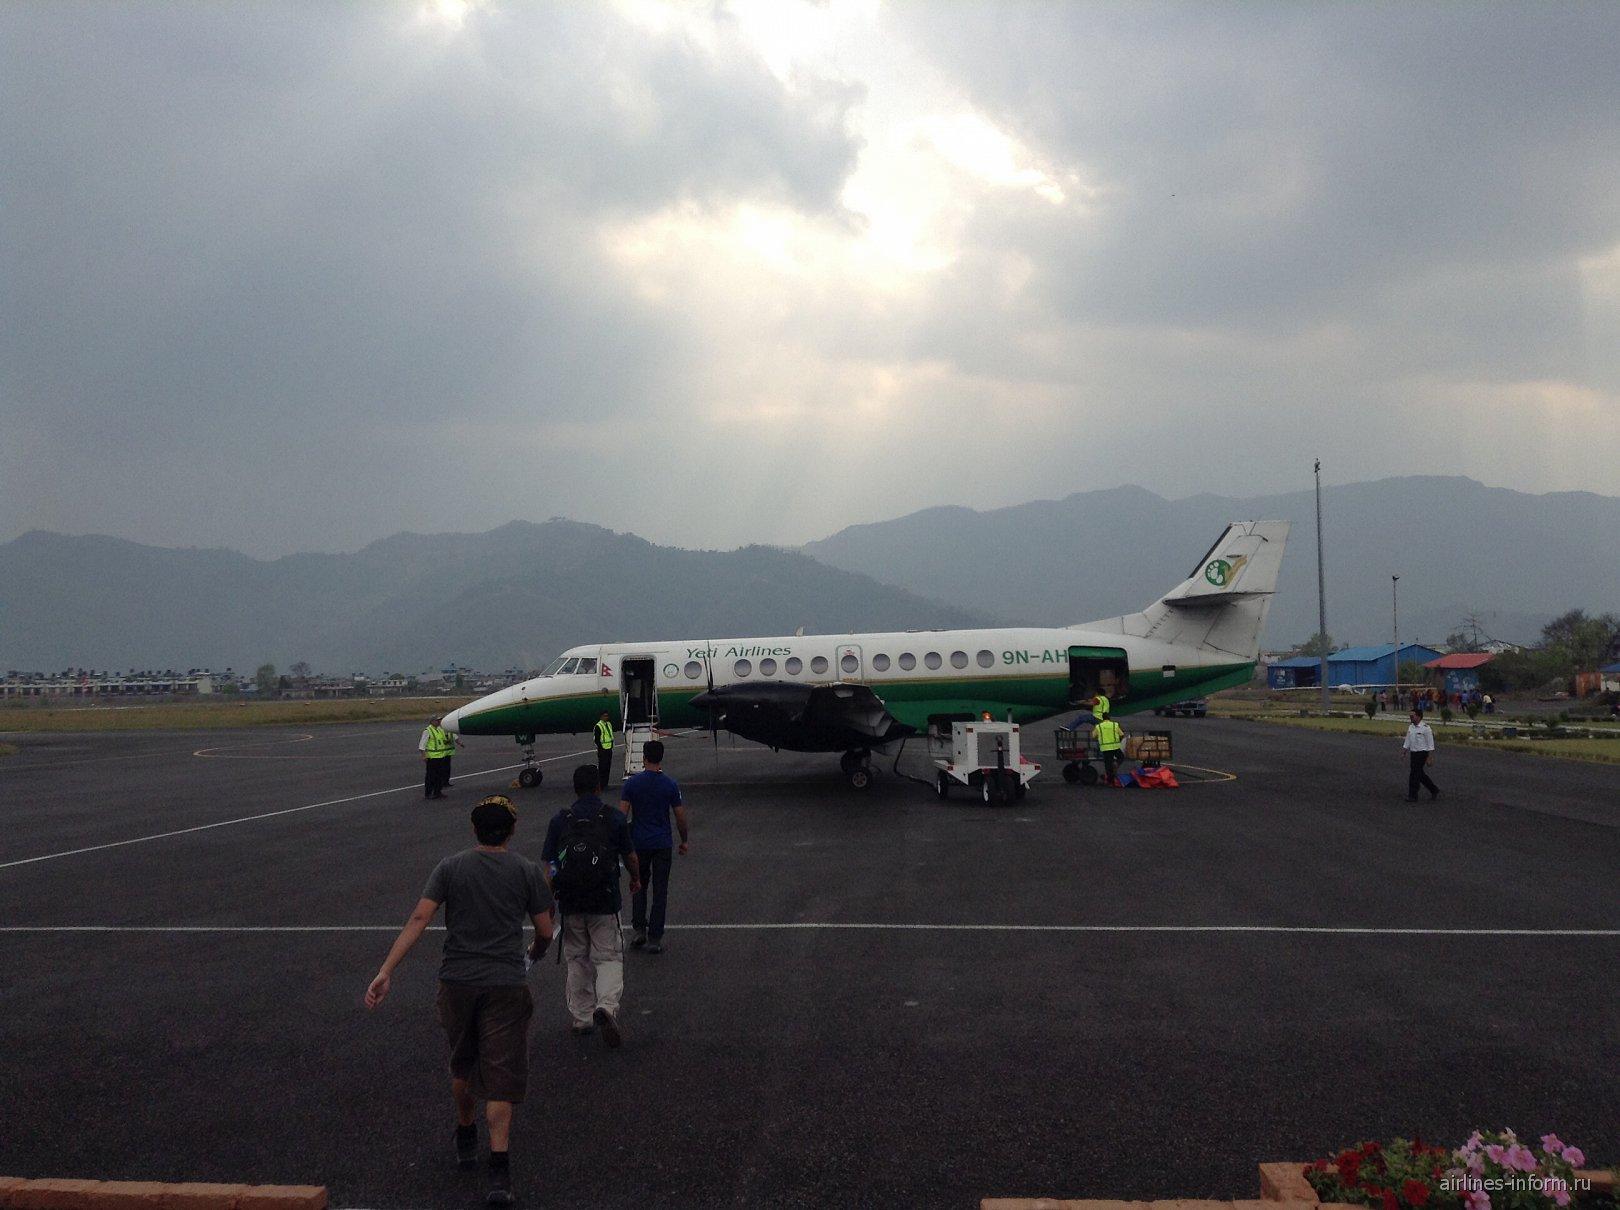 Посадка в самолет Jetstream 41 авиакомпании Yeti Airlines в аэропорту Покхара